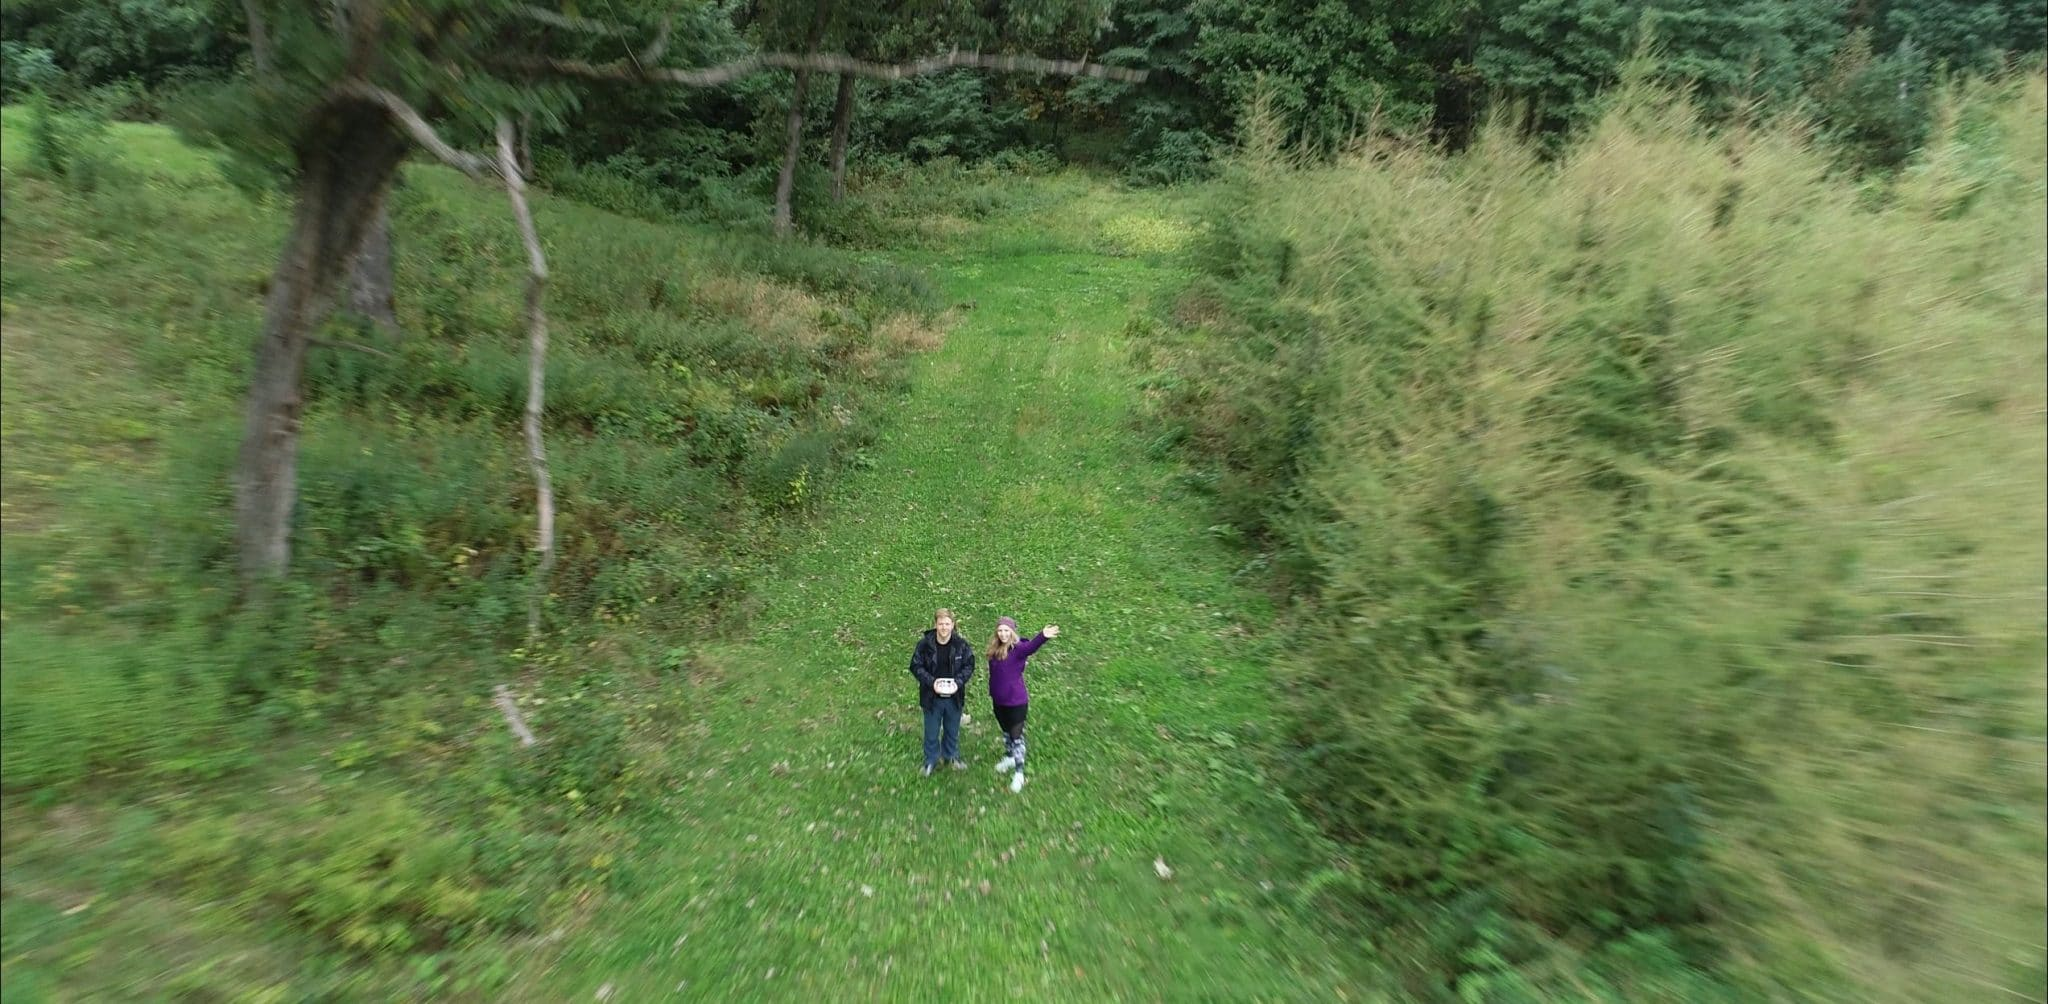 Wayside Park In Portage, Wisconsin – Drone Boomerang